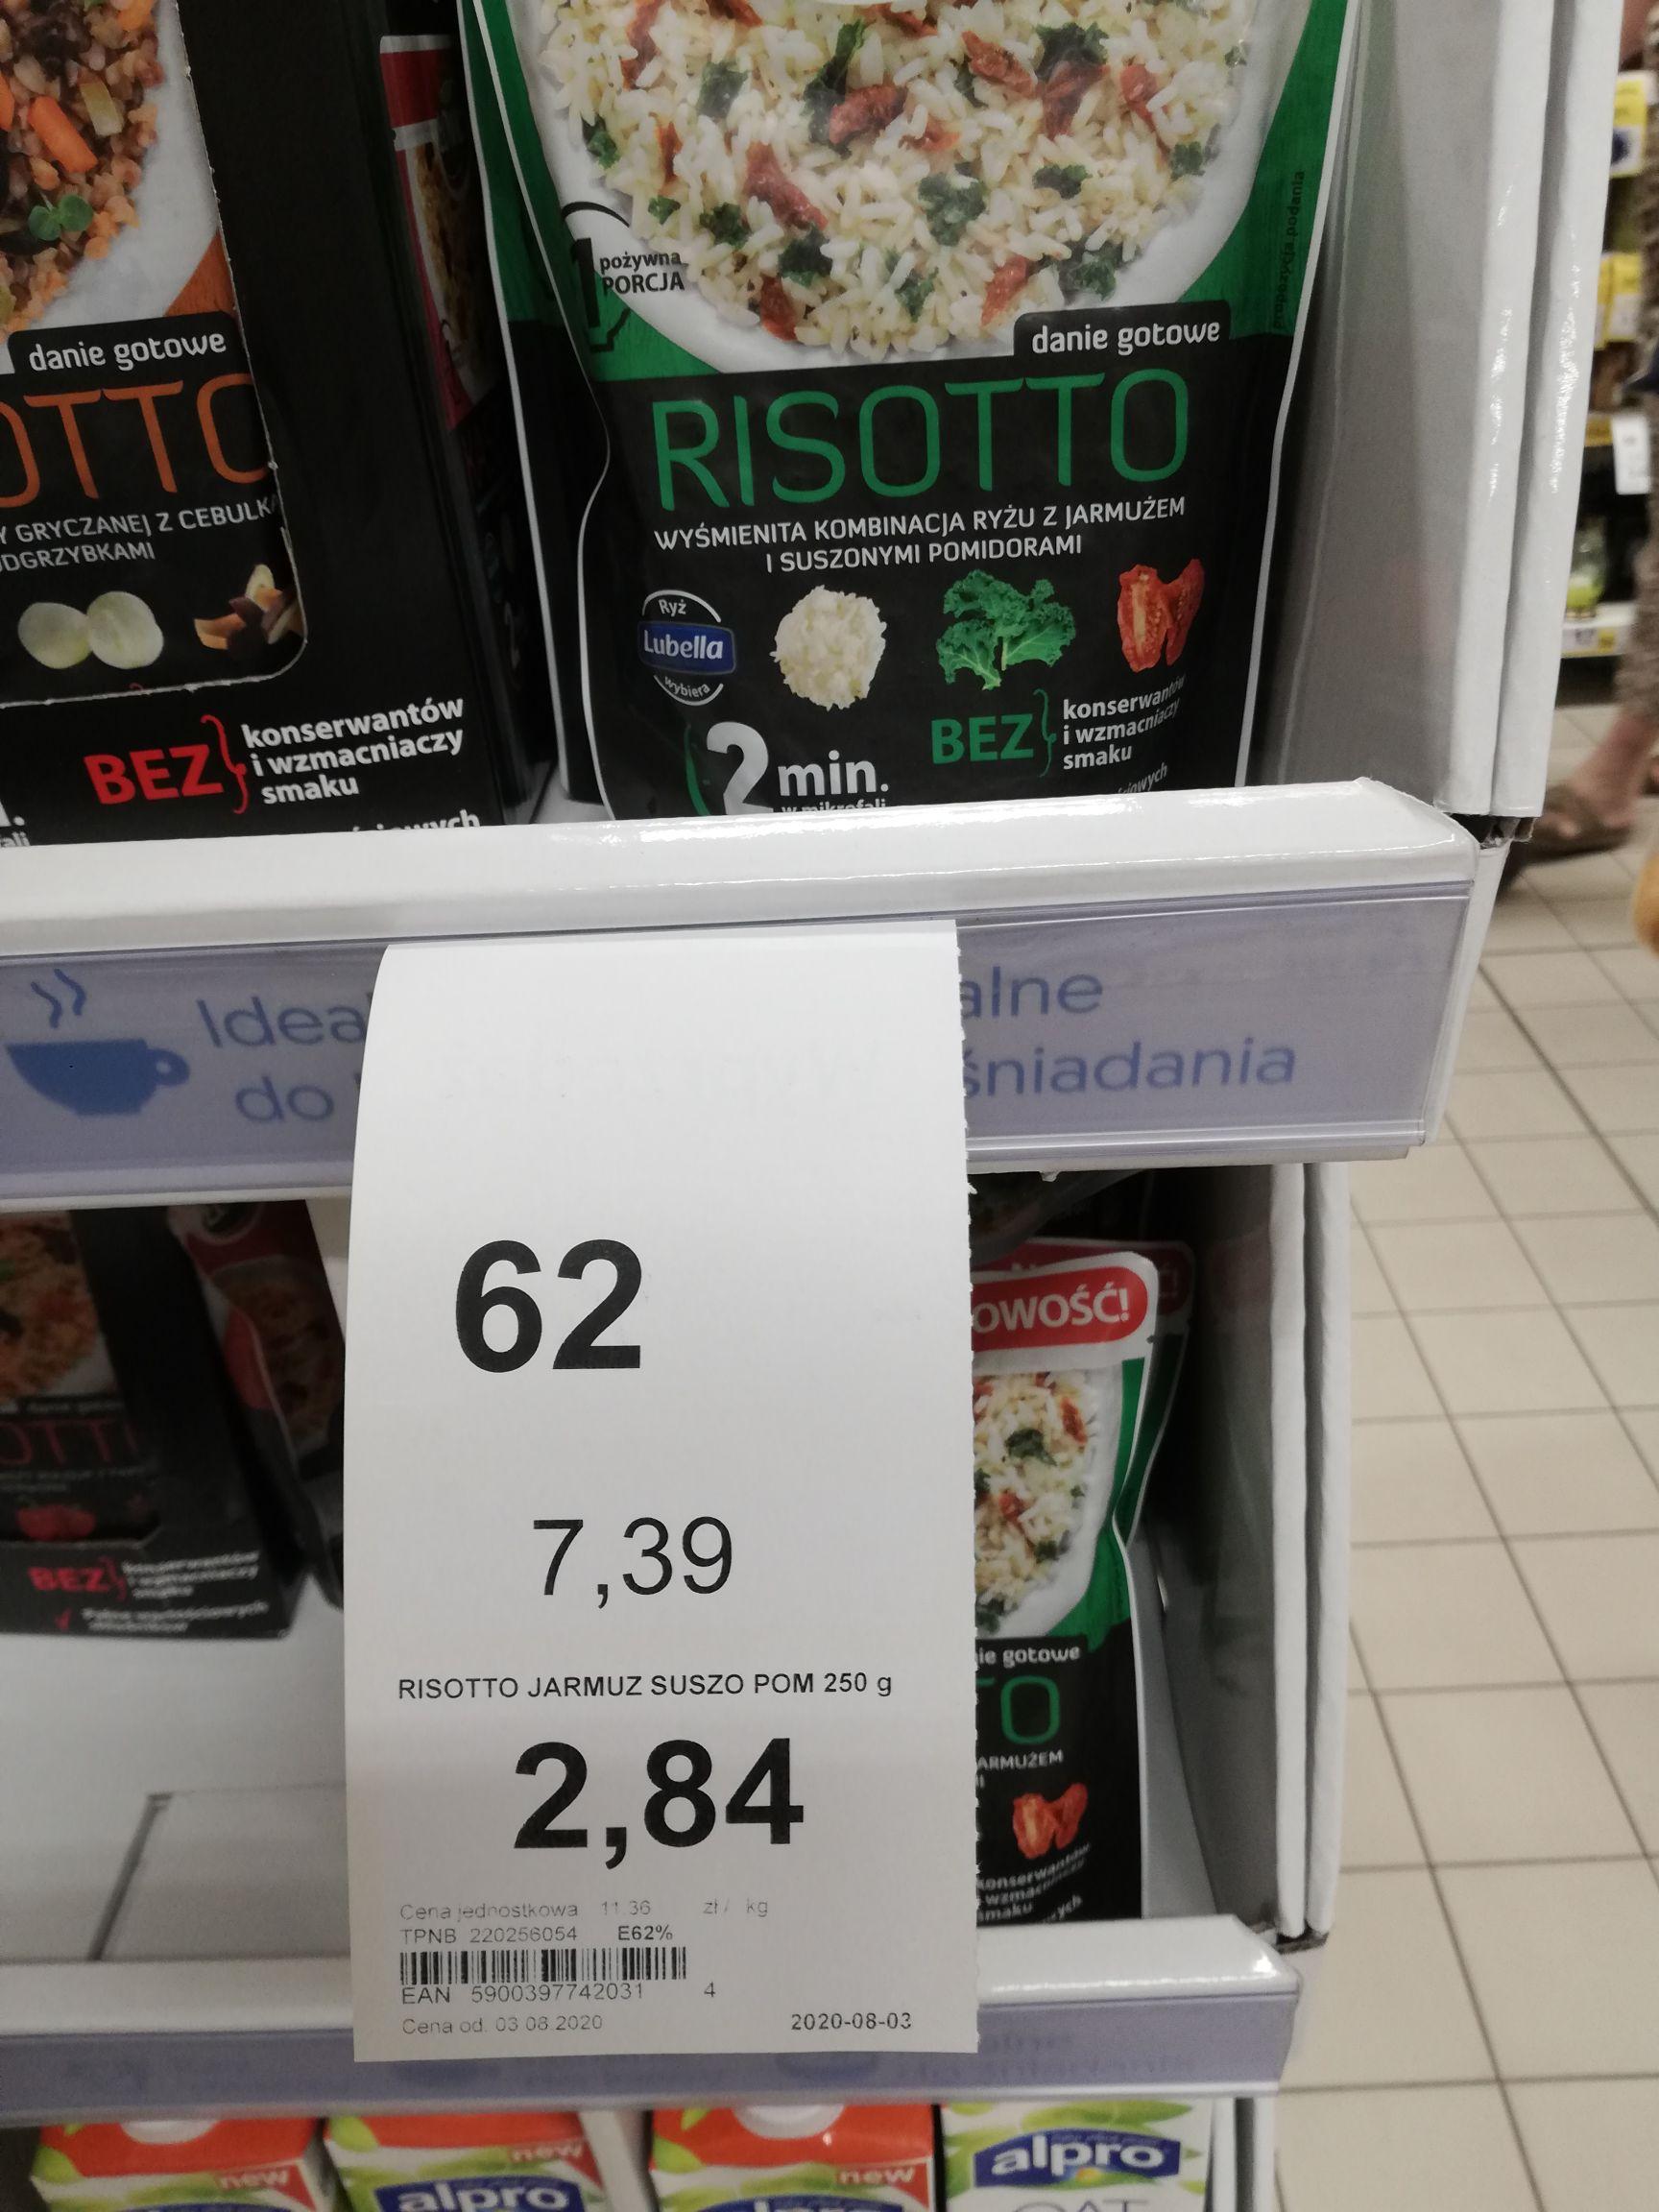 Tesco Kaszotto Łowicz lub Risotto Łowicz Mega cena